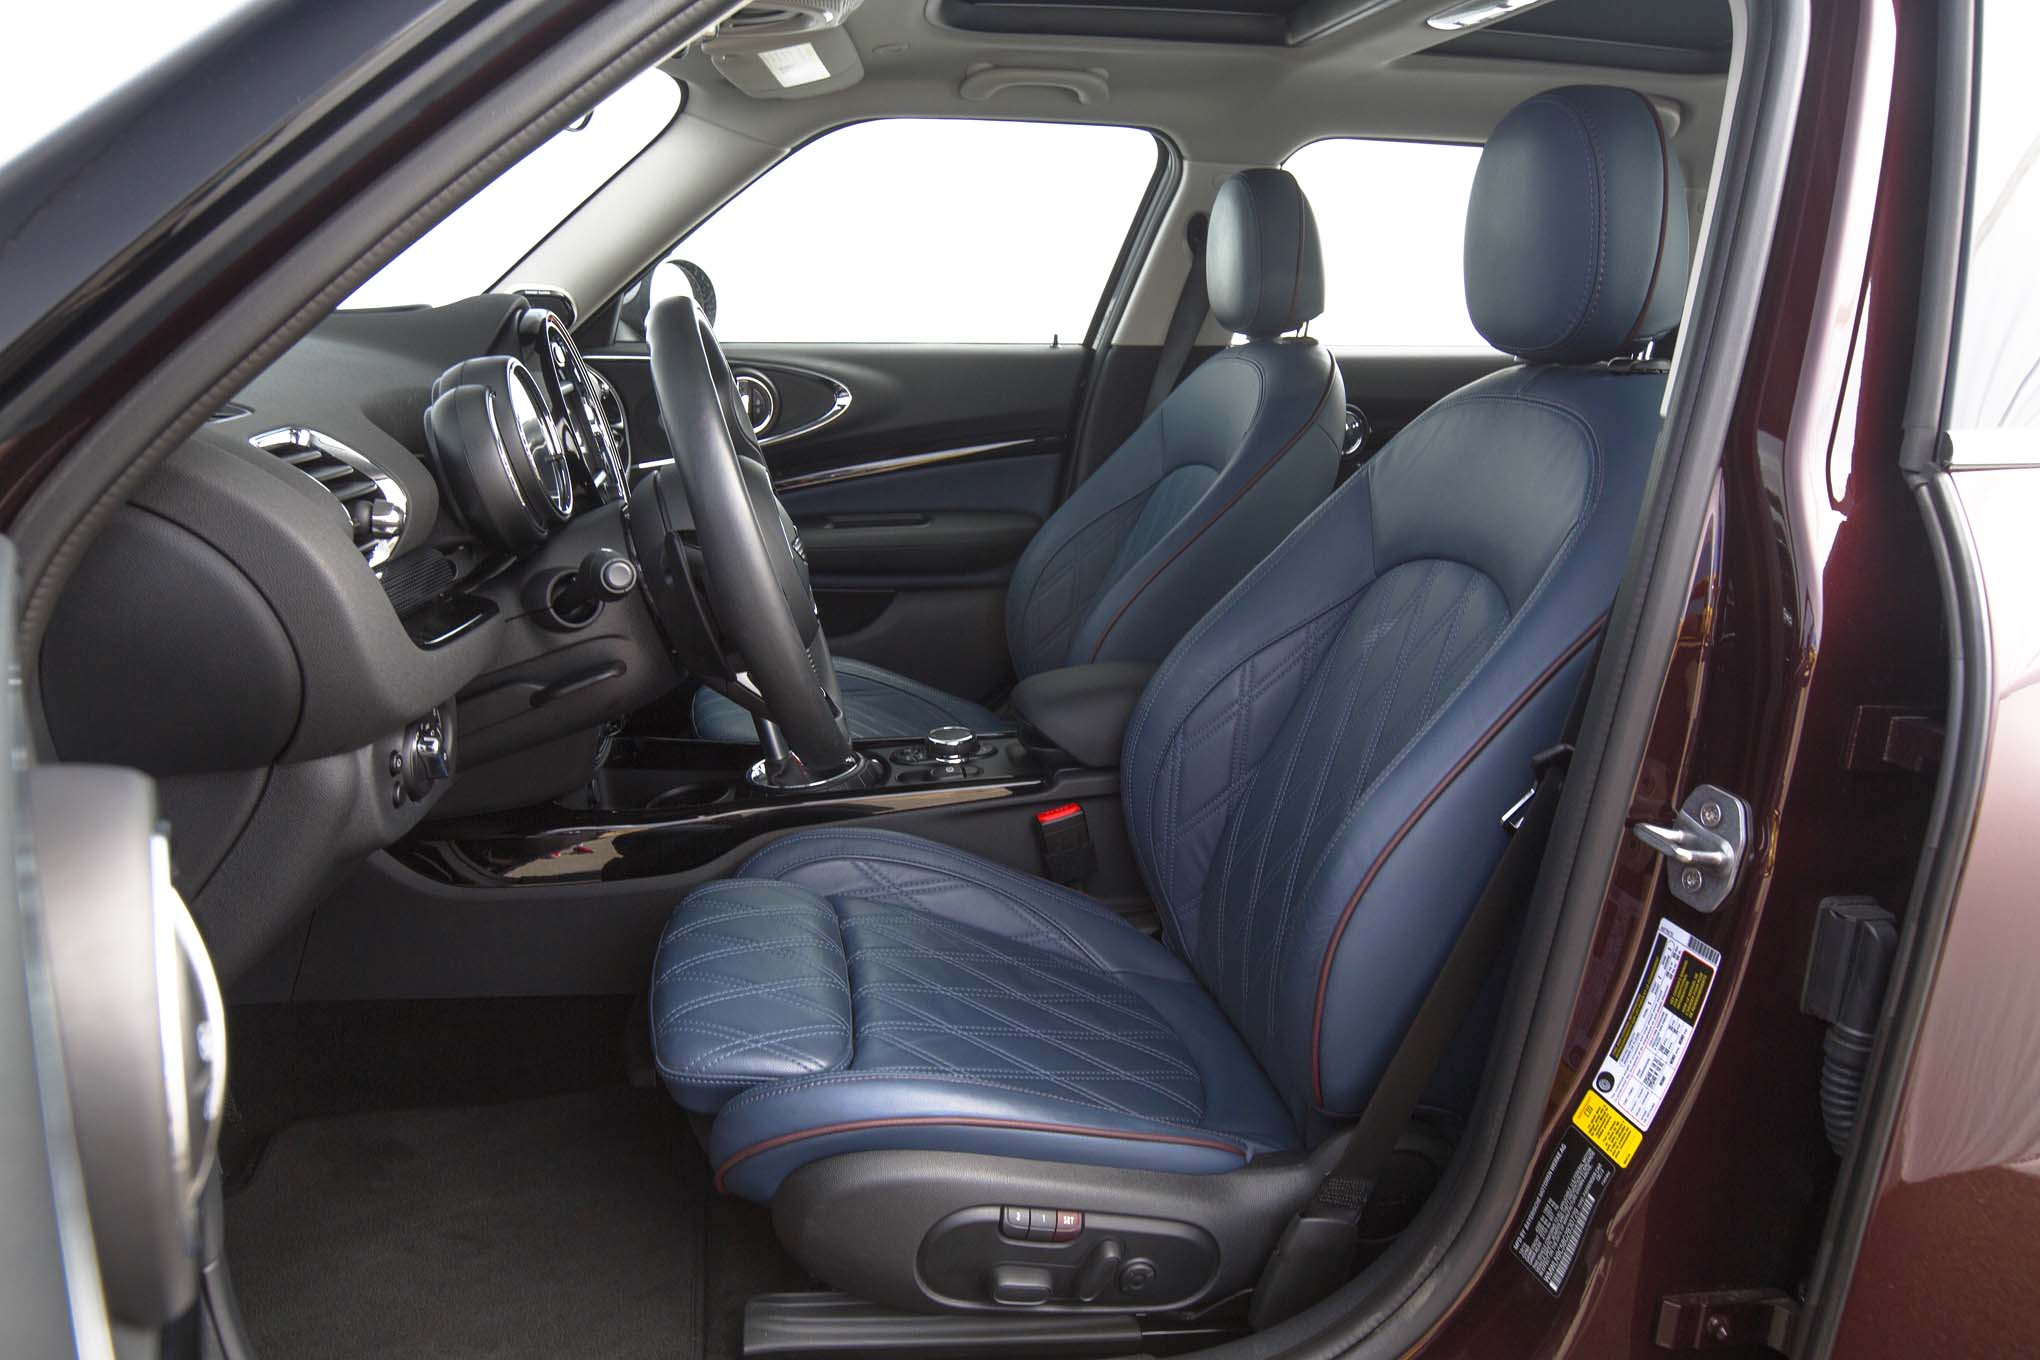 2016 Mini Cooper S Clubman Front Interior Seats Motor Trend En Español